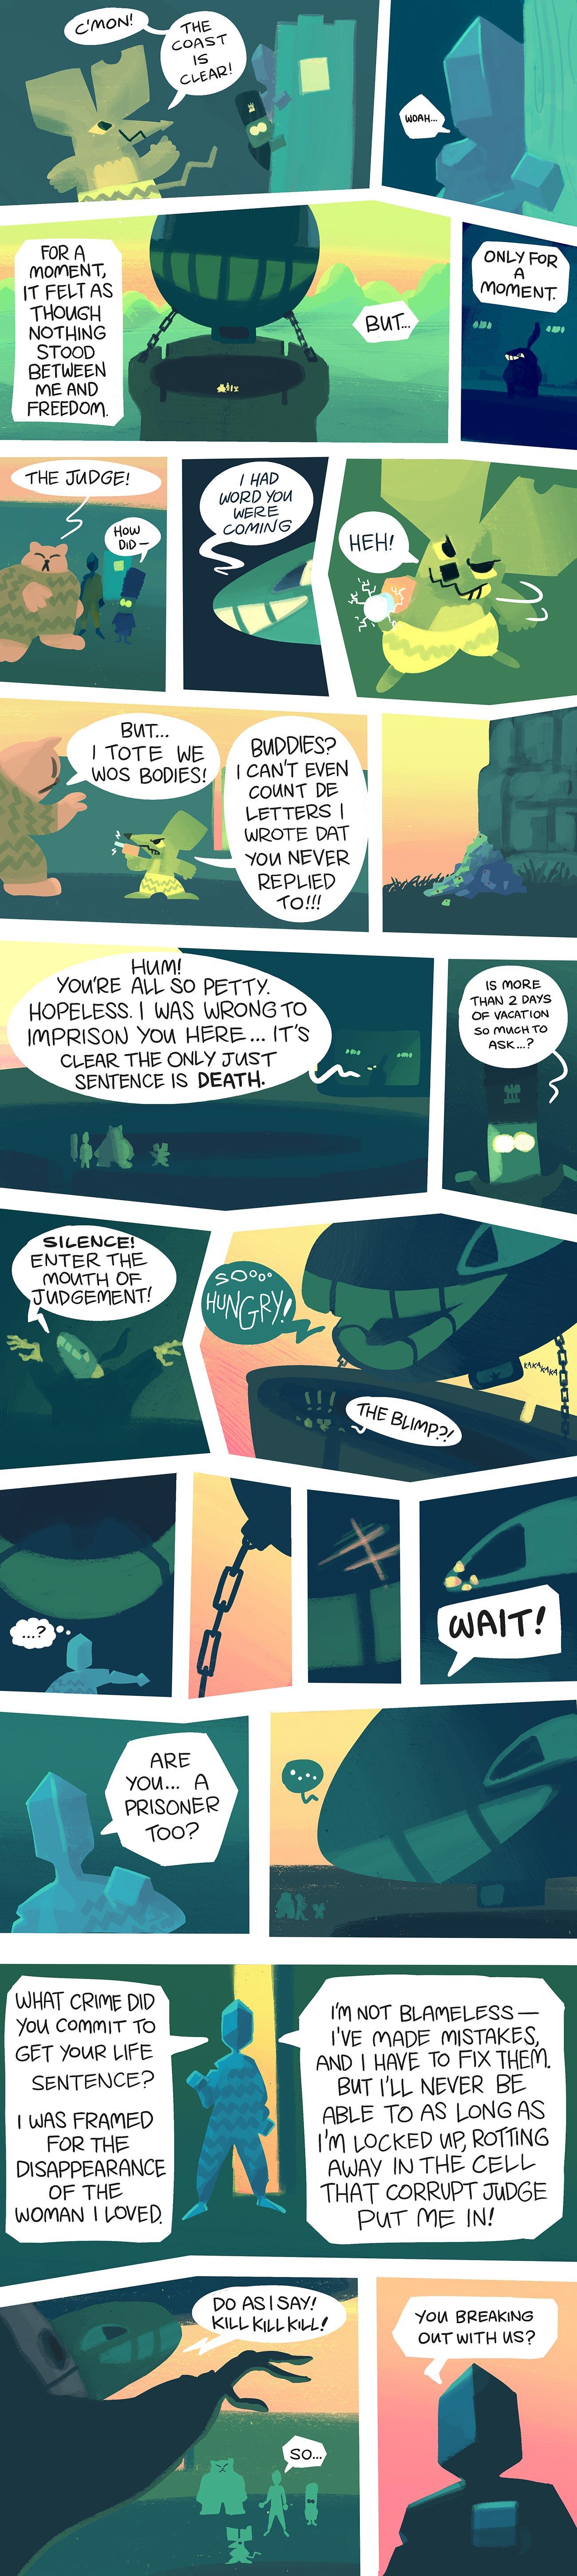 Death is Certain by Sam Gwilym, Monty #20